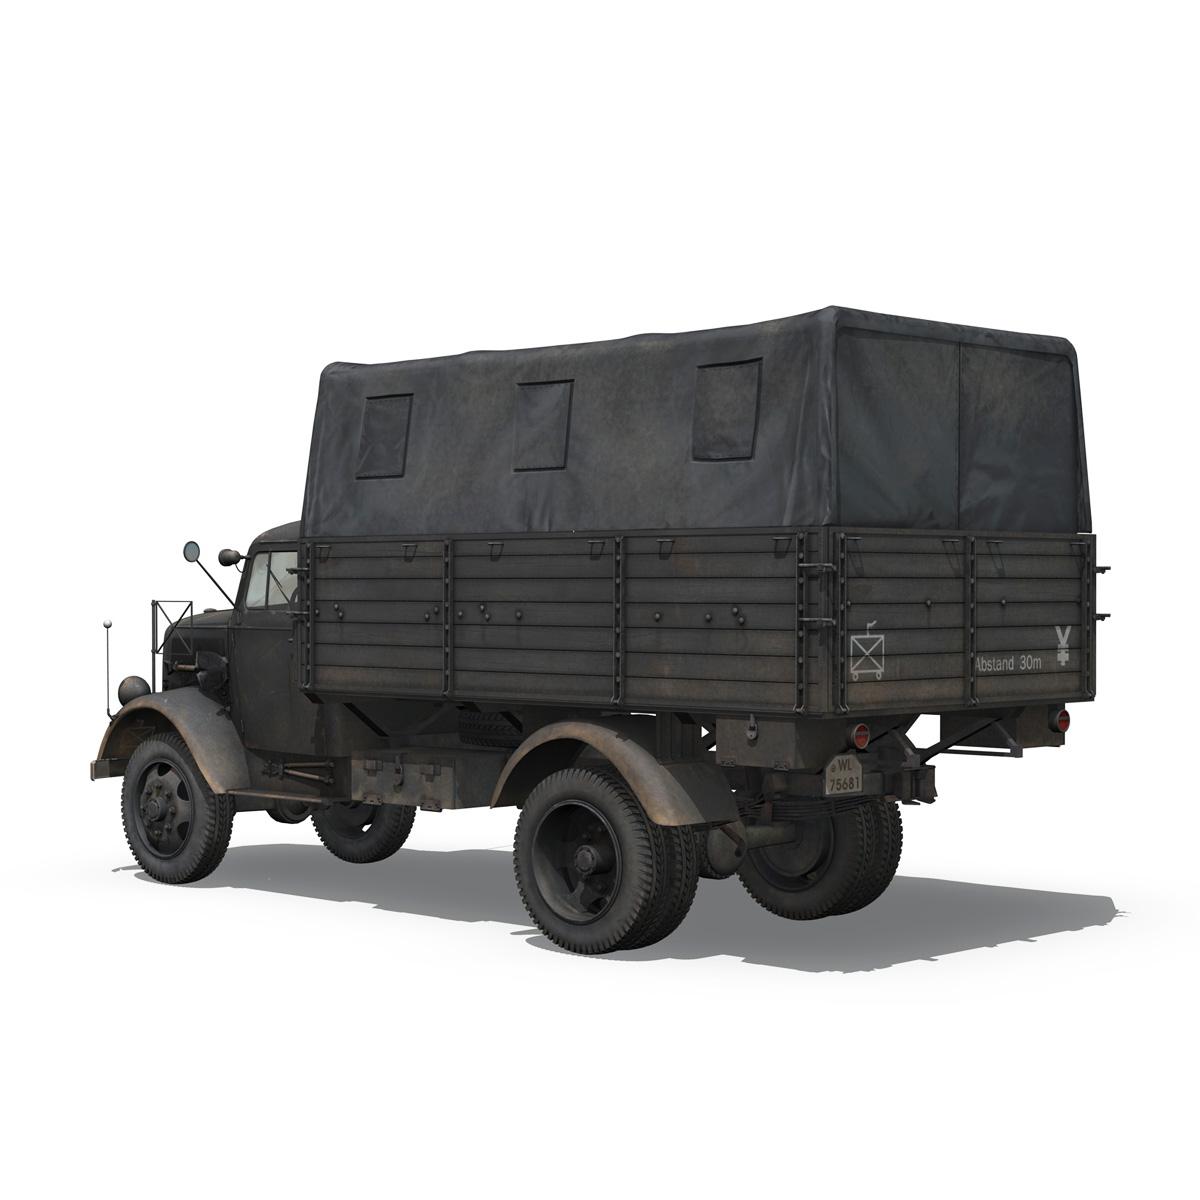 blitz opel - lori cargo 3t - 17 pzdiv model 3d 3ds fbx c4d lwo obj 197199